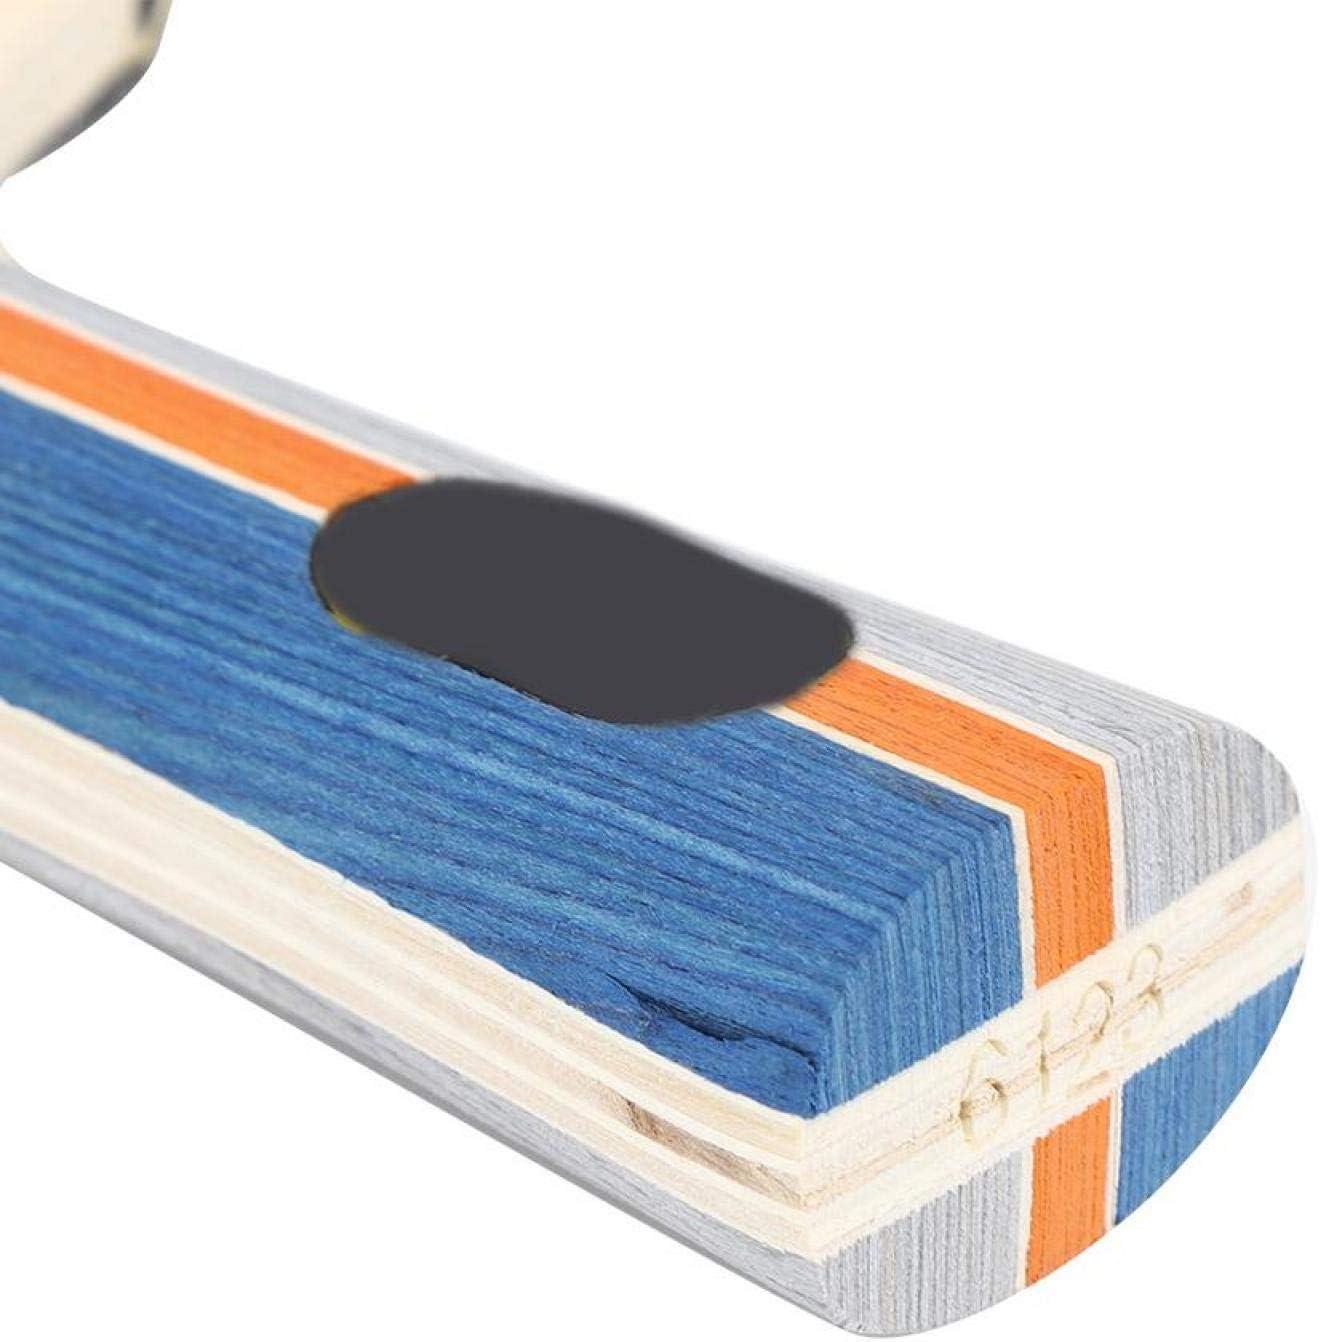 Okuyonic Control de Tenis de Mesa Ping Pong Paddle Raqueta de Tenis de Mesa Caucho para Equipos Deportivos